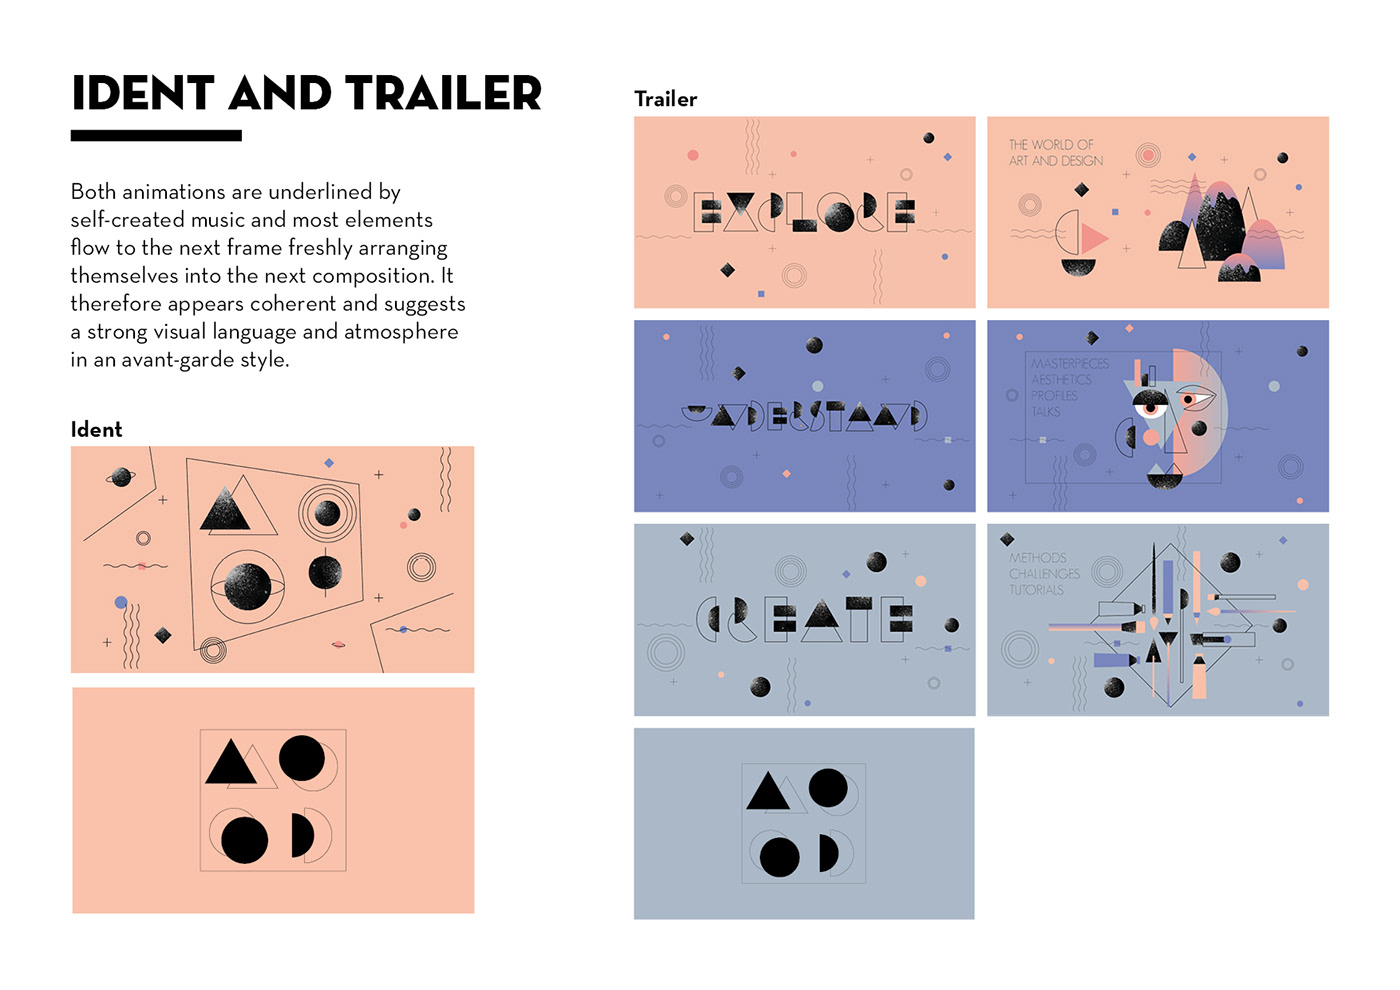 adobeawards motion graphics  animation  branding  ILLUSTRATION